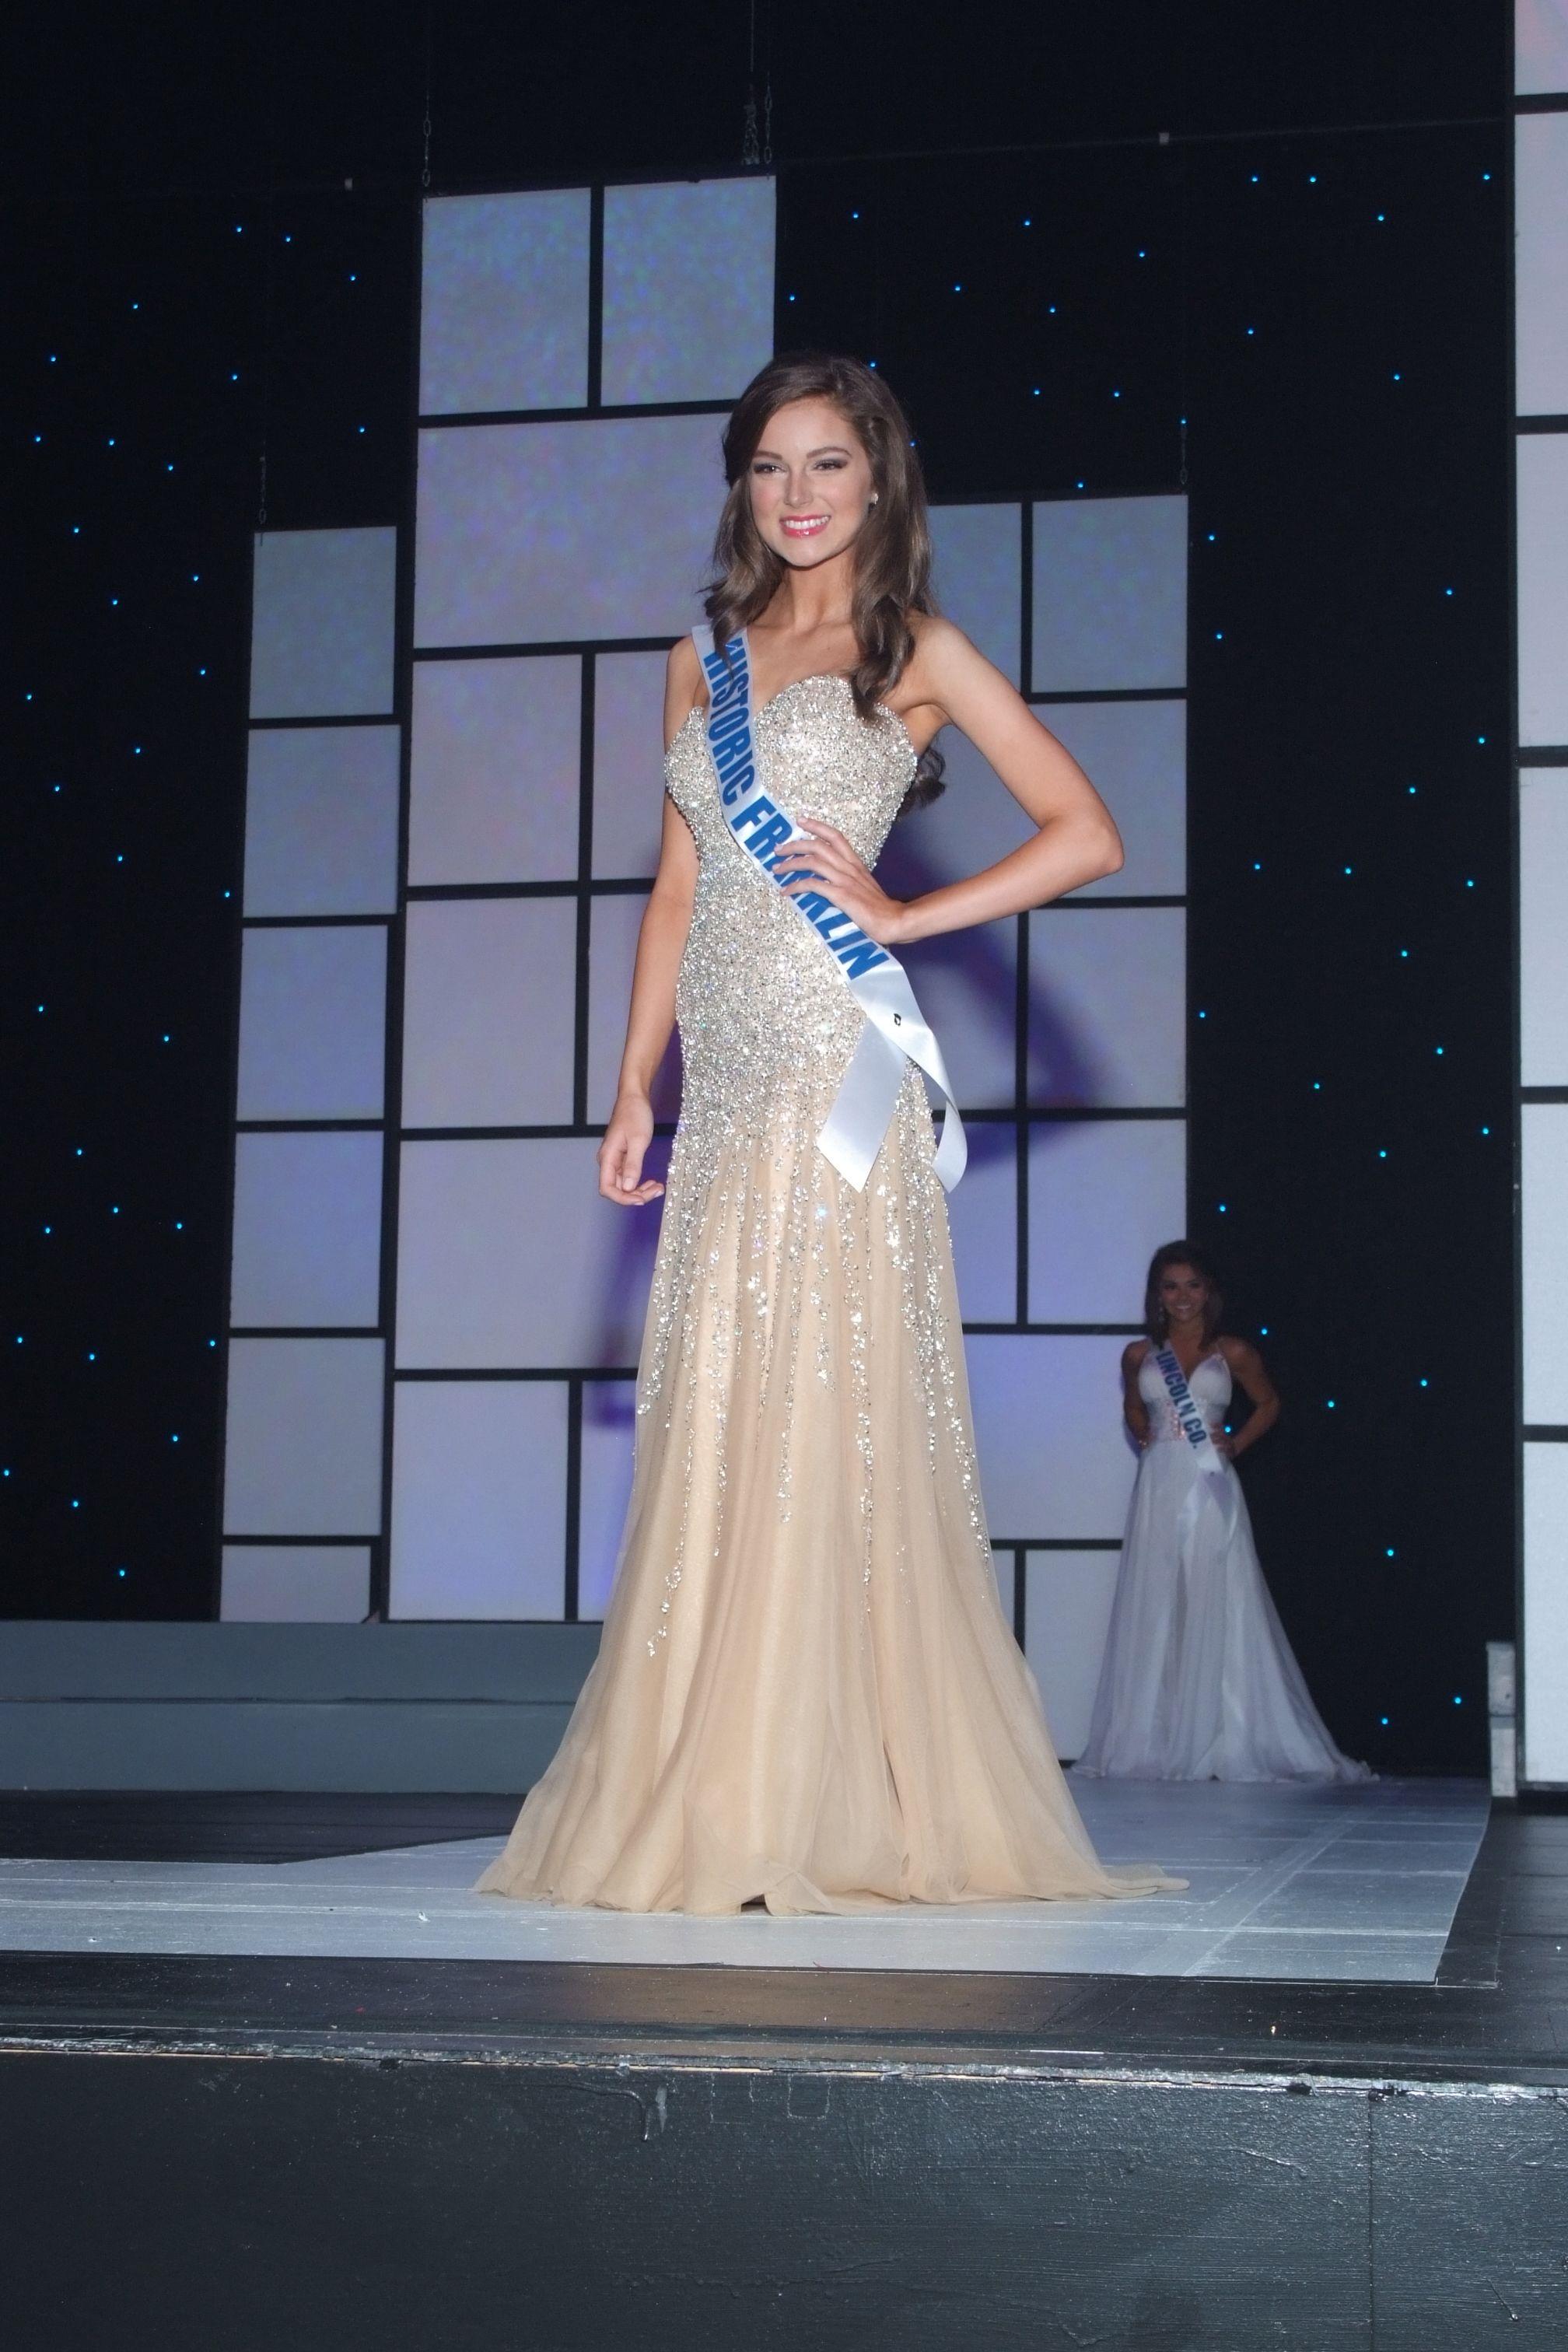 Miss Tennessee Teen USA 2013, Emily Suttle | Miss Tennessee Teen USA ...